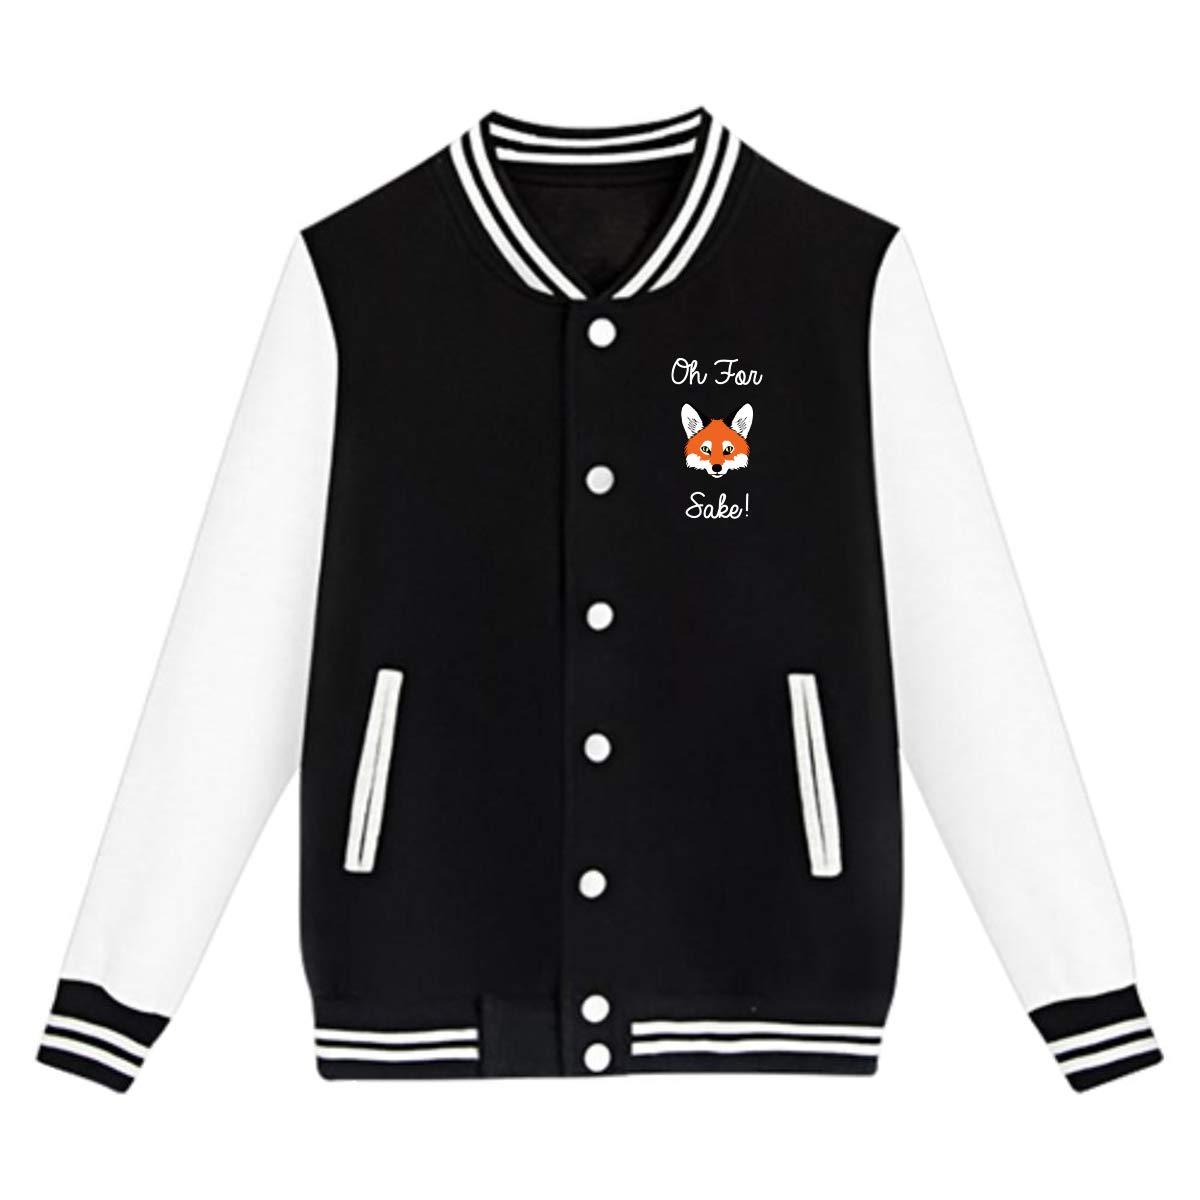 EengFang Unisex Youth Oh for Fox Sake Funny Fox Hound Funny Baseball Uniform Jacket Coat Sweater Black